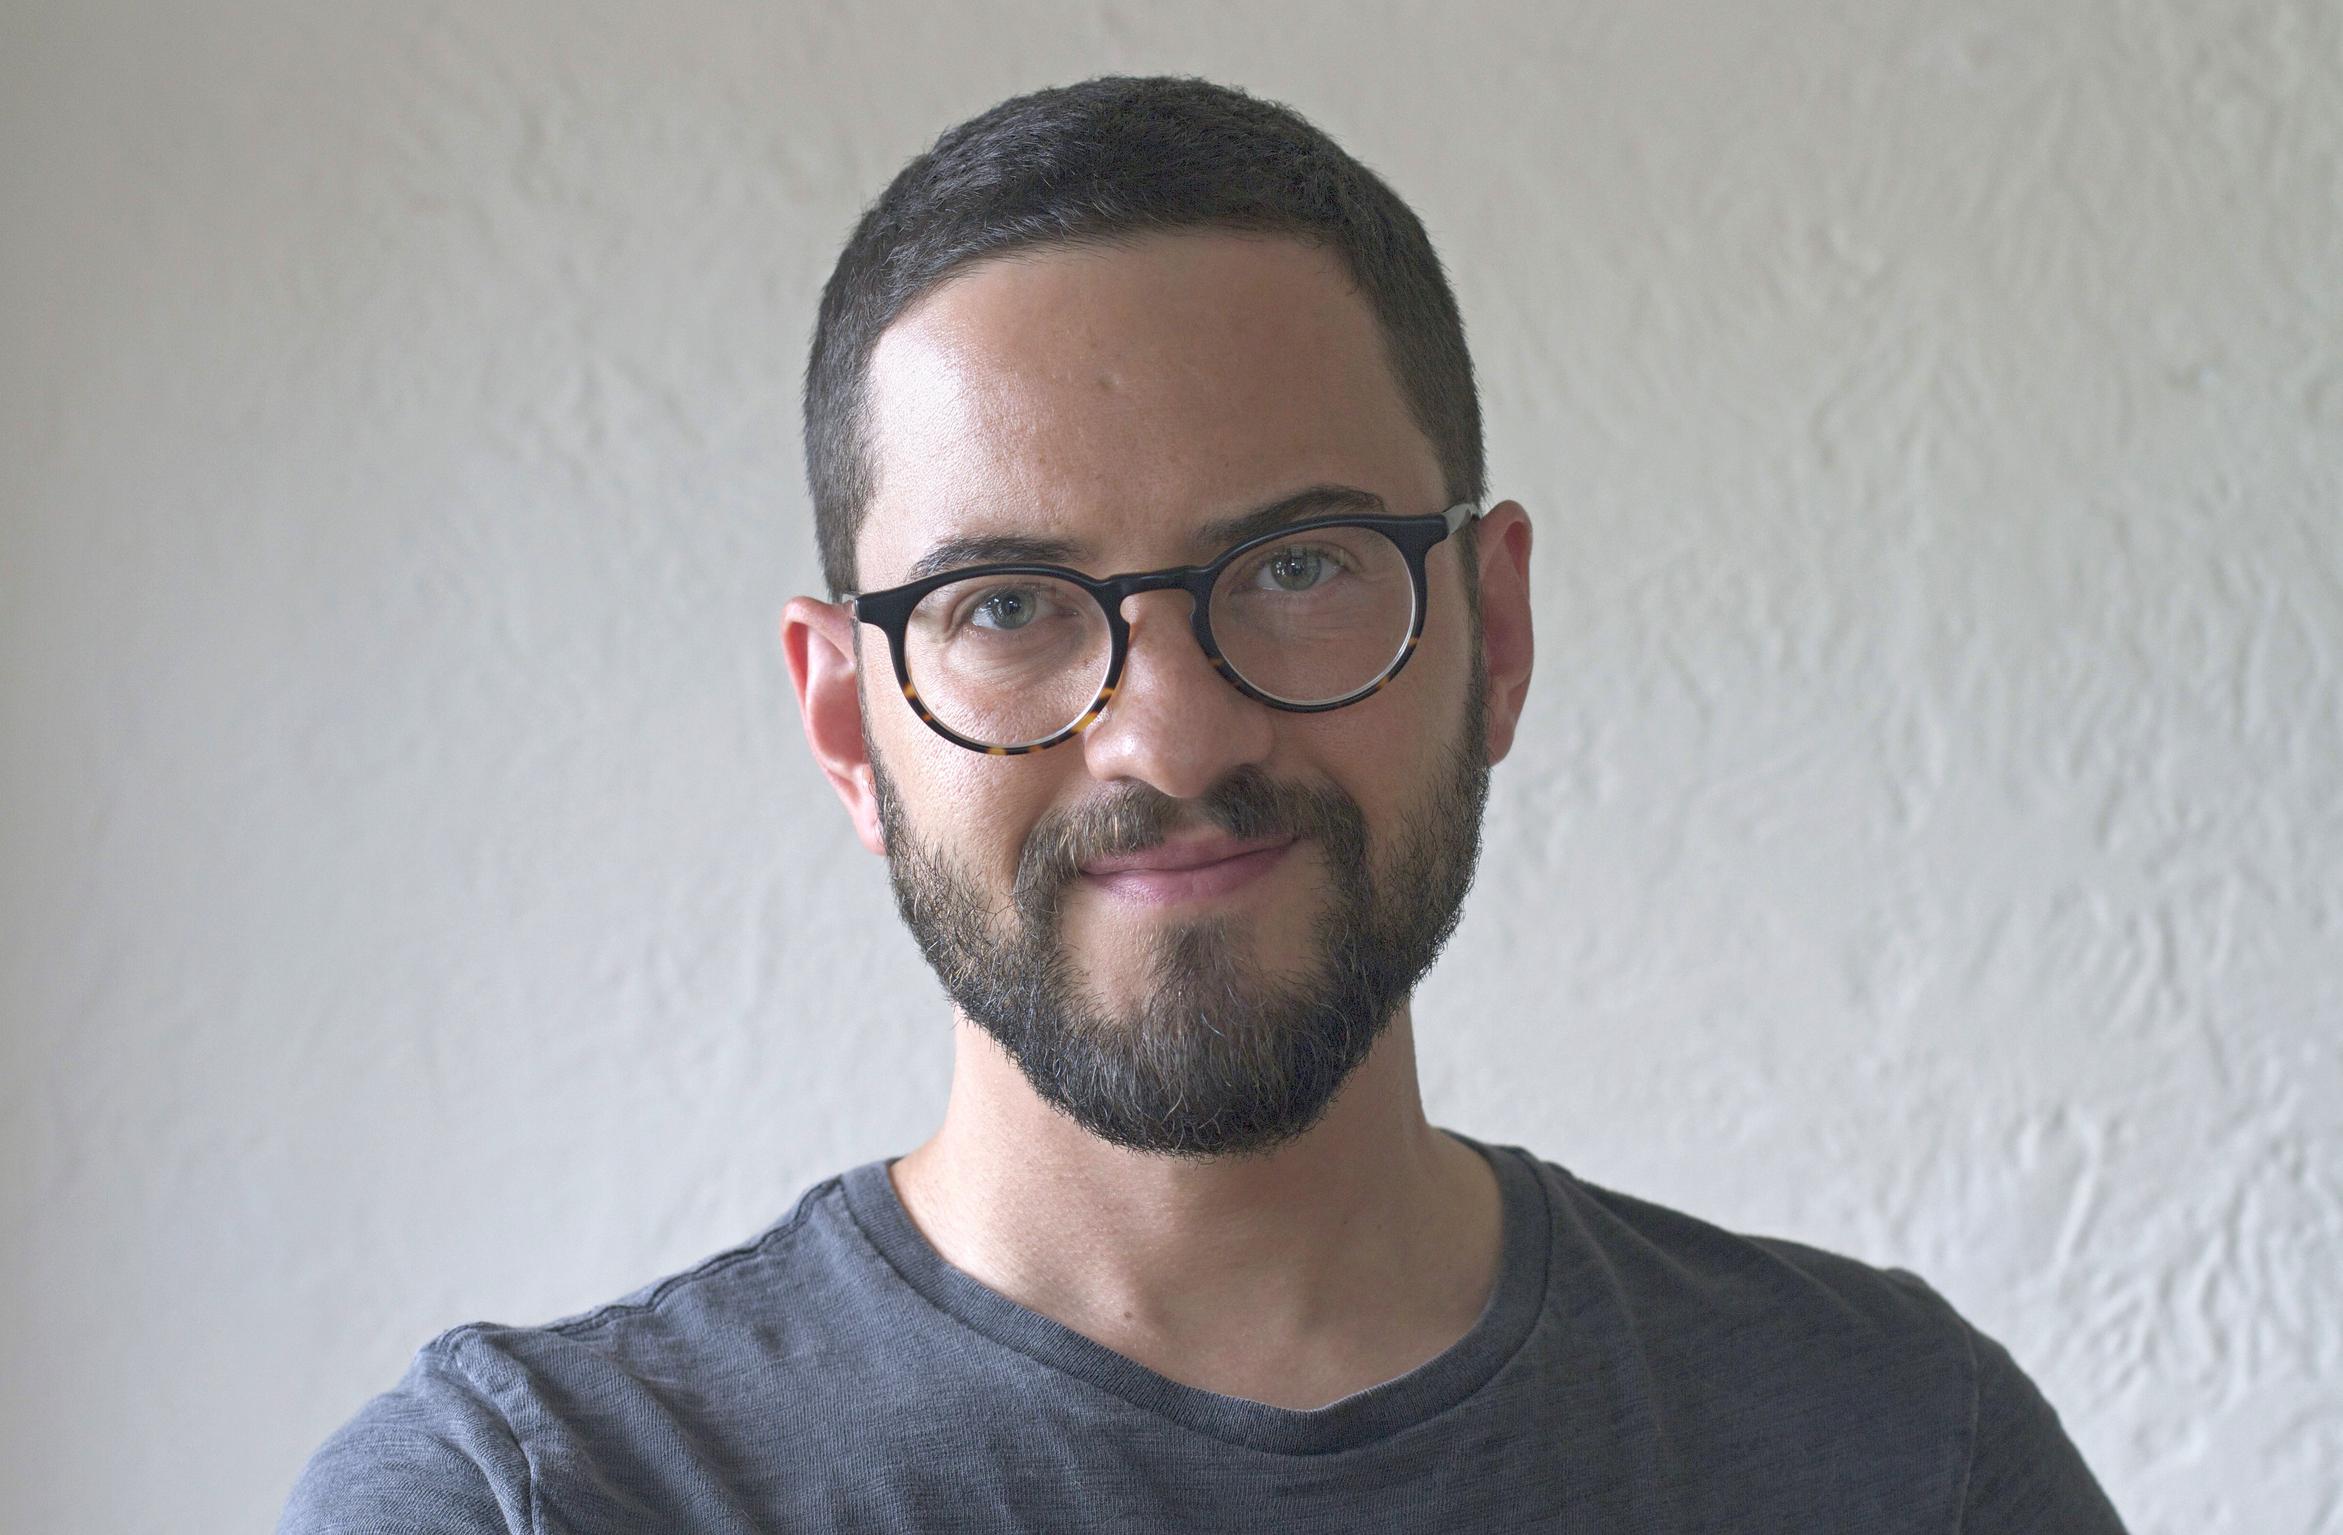 Michael Hawkins-Burgos